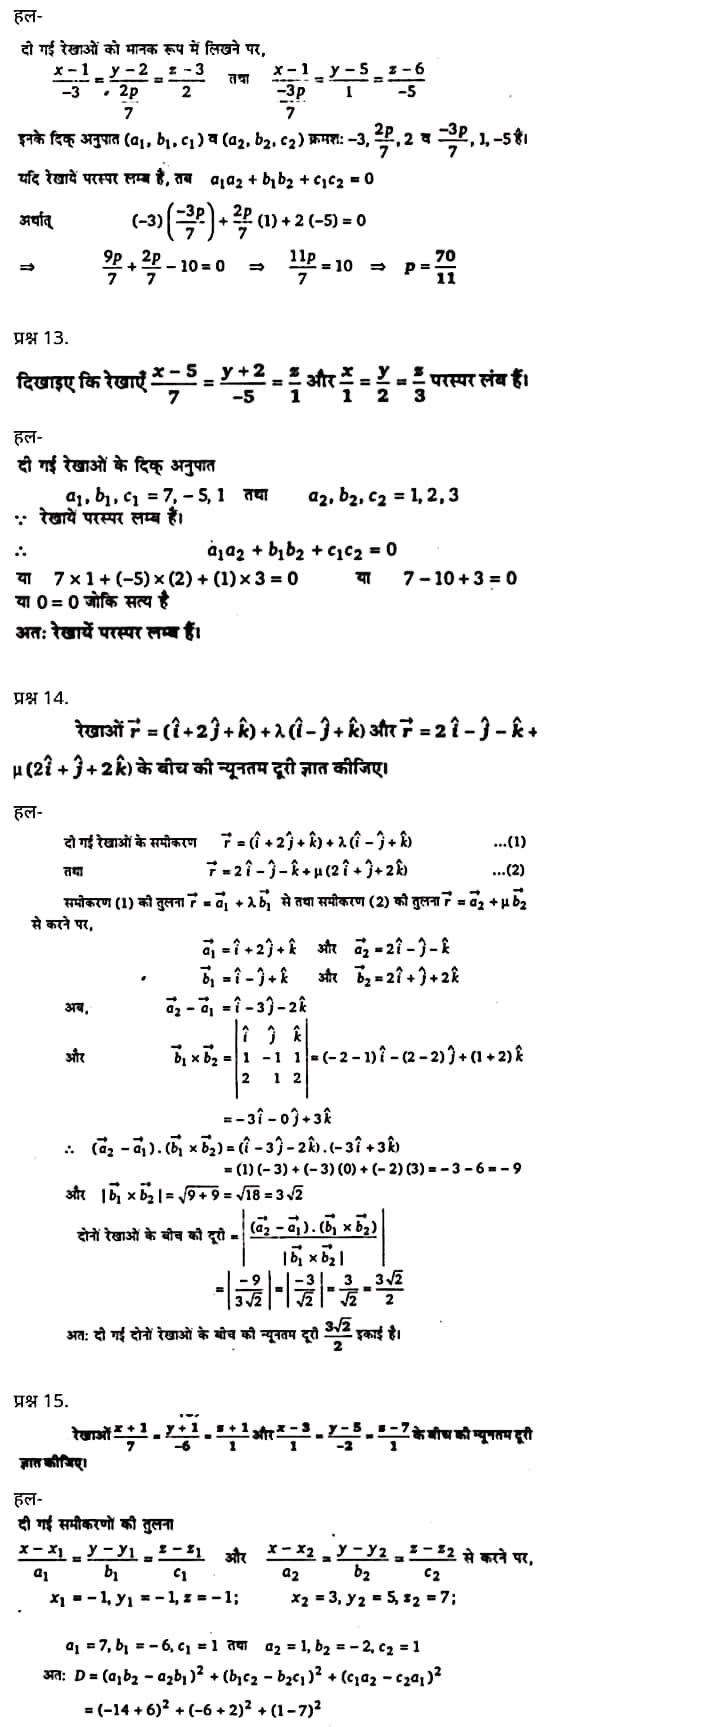 """Class 12 Maths Chapter 11"", ""Three Dimensional Geometry"", Hindi Medium मैथ्स कक्षा 12 नोट्स pdf,  मैथ्स कक्षा 12 नोट्स 2021 NCERT,  मैथ्स कक्षा 12 PDF,  मैथ्स पुस्तक,  मैथ्स की बुक,  मैथ्स प्रश्नोत्तरी Class 12, 12 वीं मैथ्स पुस्तक RBSE,  बिहार बोर्ड 12 वीं मैथ्स नोट्स,   12th Maths book in hindi,12th Maths notes in hindi,cbse books for class 12,cbse books in hindi,cbse ncert books,class 12 Maths notes in hindi,class 12 hindi ncert solutions,Maths 2020,Maths 2021,Maths 2022,Maths book class 12,Maths book in hindi,Maths class 12 in hindi,Maths notes for class 12 up board in hindi,ncert all books,ncert app in hindi,ncert book solution,ncert books class 10,ncert books class 12,ncert books for class 7,ncert books for upsc in hindi,ncert books in hindi class 10,ncert books in hindi for class 12 Maths,ncert books in hindi for class 6,ncert books in hindi pdf,ncert class 12 hindi book,ncert english book,ncert Maths book in hindi,ncert Maths books in hindi pdf,ncert Maths class 12,ncert in hindi,old ncert books in hindi,online ncert books in hindi,up board 12th,up board 12th syllabus,up board class 10 hindi book,up board class 12 books,up board class 12 new syllabus,up Board Maths 2020,up Board Maths 2021,up Board Maths 2022,up Board Maths 2023,up board intermediate Maths syllabus,up board intermediate syllabus 2021,Up board Master 2021,up board model paper 2021,up board model paper all subject,up board new syllabus of class 12th Maths,up board paper 2021,Up board syllabus 2021,UP board syllabus 2022,  12 वीं मैथ्स पुस्तक हिंदी में, 12 वीं मैथ्स नोट्स हिंदी में, कक्षा 12 के लिए सीबीएससी पुस्तकें, हिंदी में सीबीएससी पुस्तकें, सीबीएससी  पुस्तकें, कक्षा 12 मैथ्स नोट्स हिंदी में, कक्षा 12 हिंदी एनसीईआरटी समाधान, मैथ्स 2020, मैथ्स 2021, मैथ्स 2022, मैथ्स  बुक क्लास 12, मैथ्स बुक इन हिंदी, बायोलॉजी क्लास 12 हिंदी में, मैथ्स नोट्स इन क्लास 12 यूपी  बोर्ड इन हिंदी, एनसीईआरटी मैथ्स की किताब हिंदी में,  बोर्ड 12 वीं तक, 12 वीं तक की पाठ्यक्रम, बोर्ड कक्षा 10 की हिंदी पुस्तक  , बोर्ड"